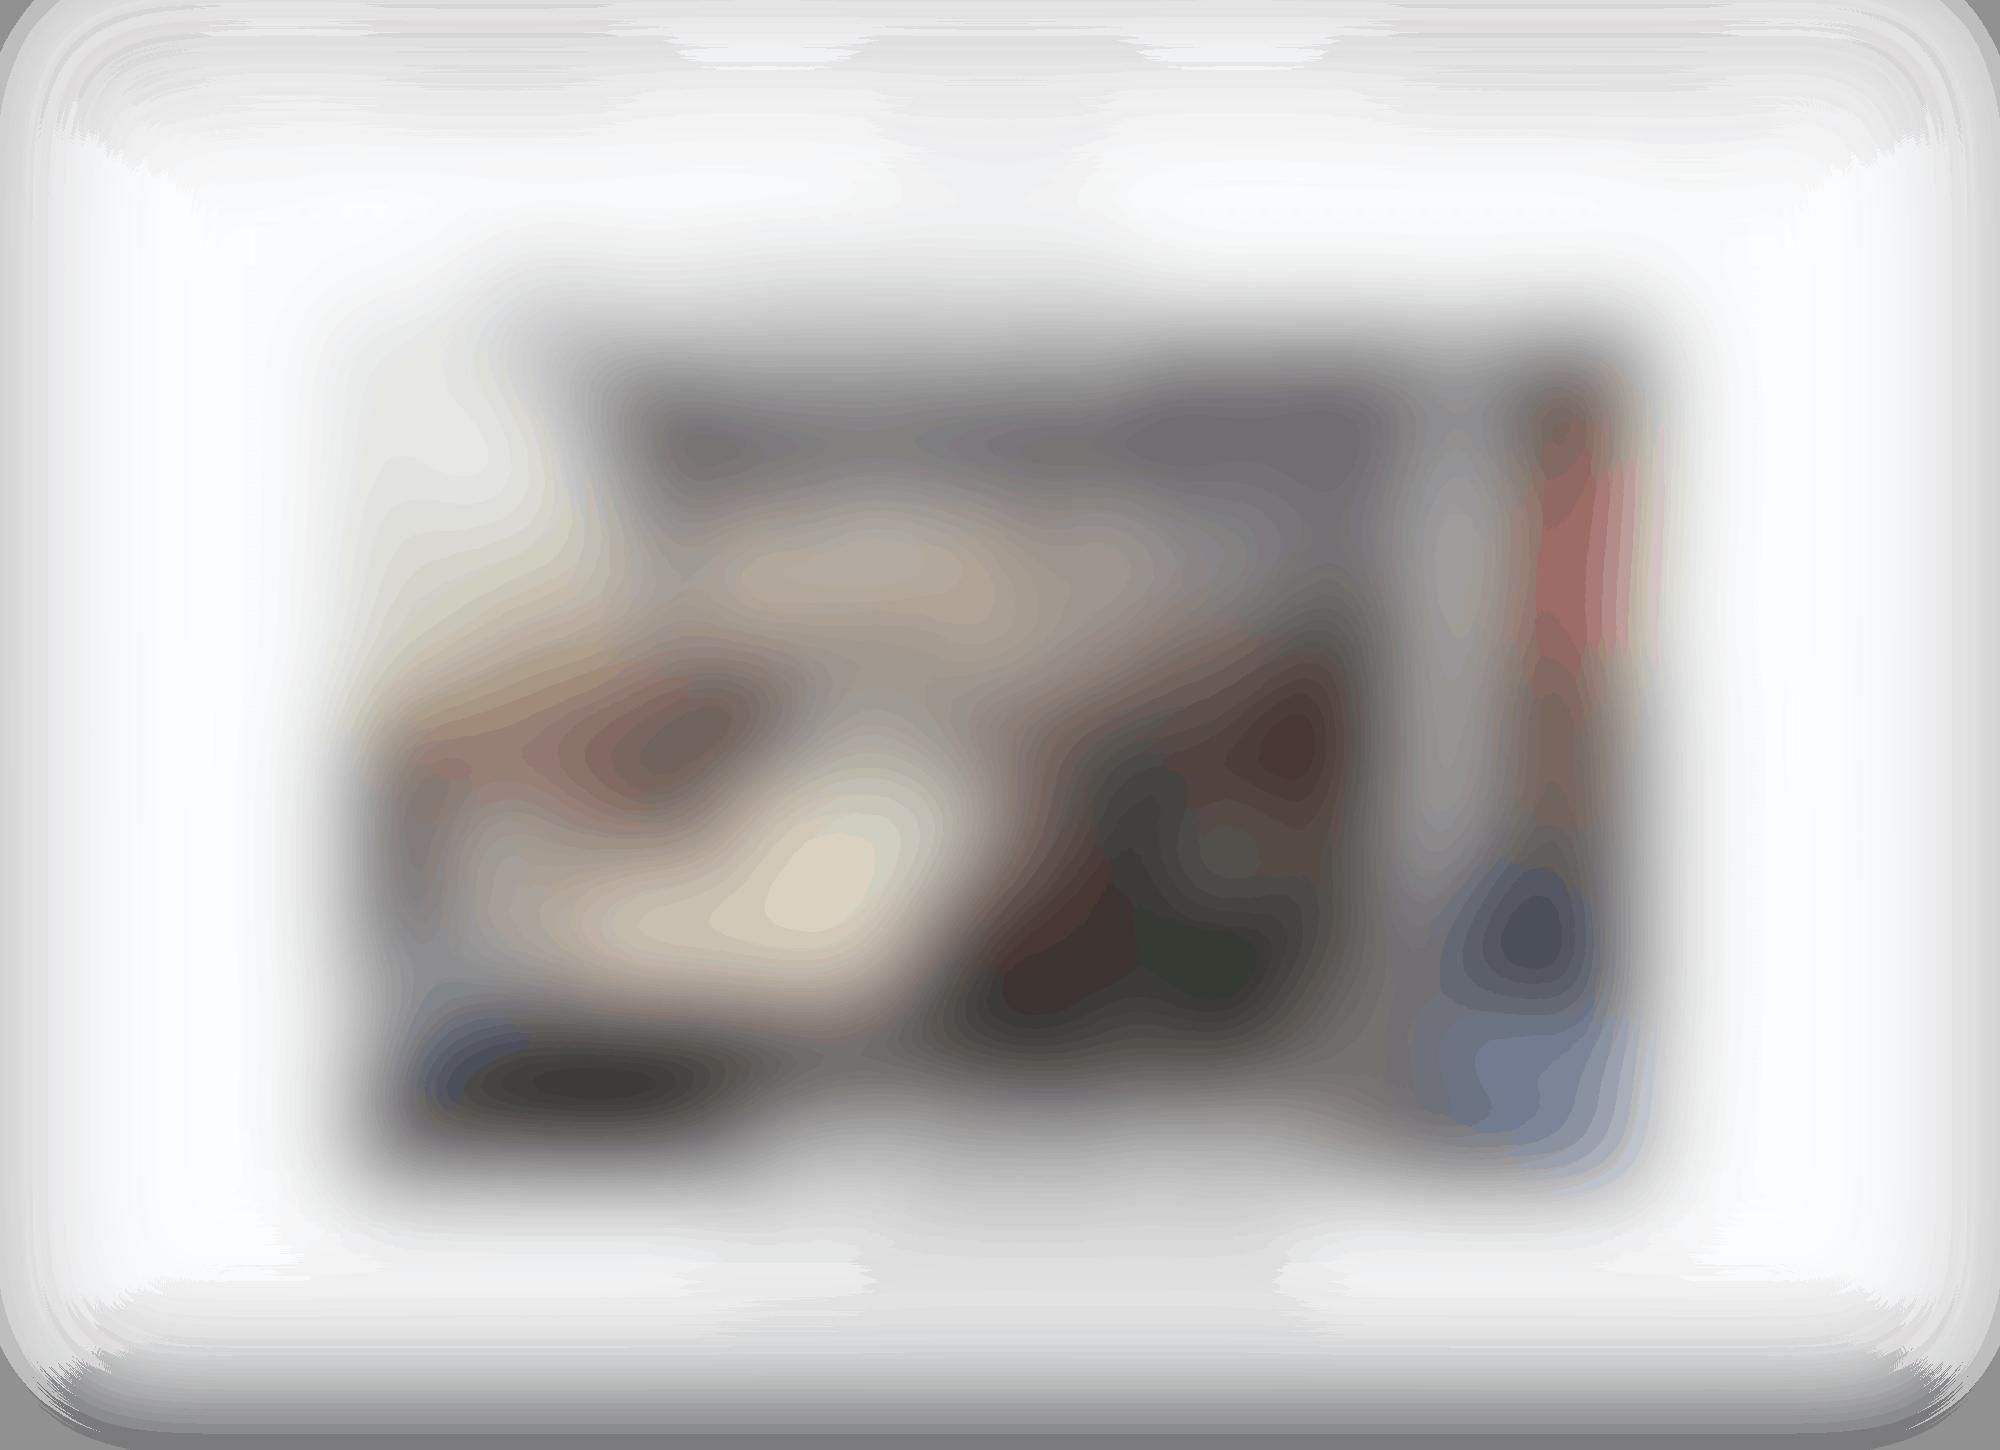 Screen Shot 2018 03 16 at 12 12 54 autocompressfitresizeixlibphp 1 1 0max h2000max w3 D2000q80s35e4addbf3e99a35f2075333cad1f49b